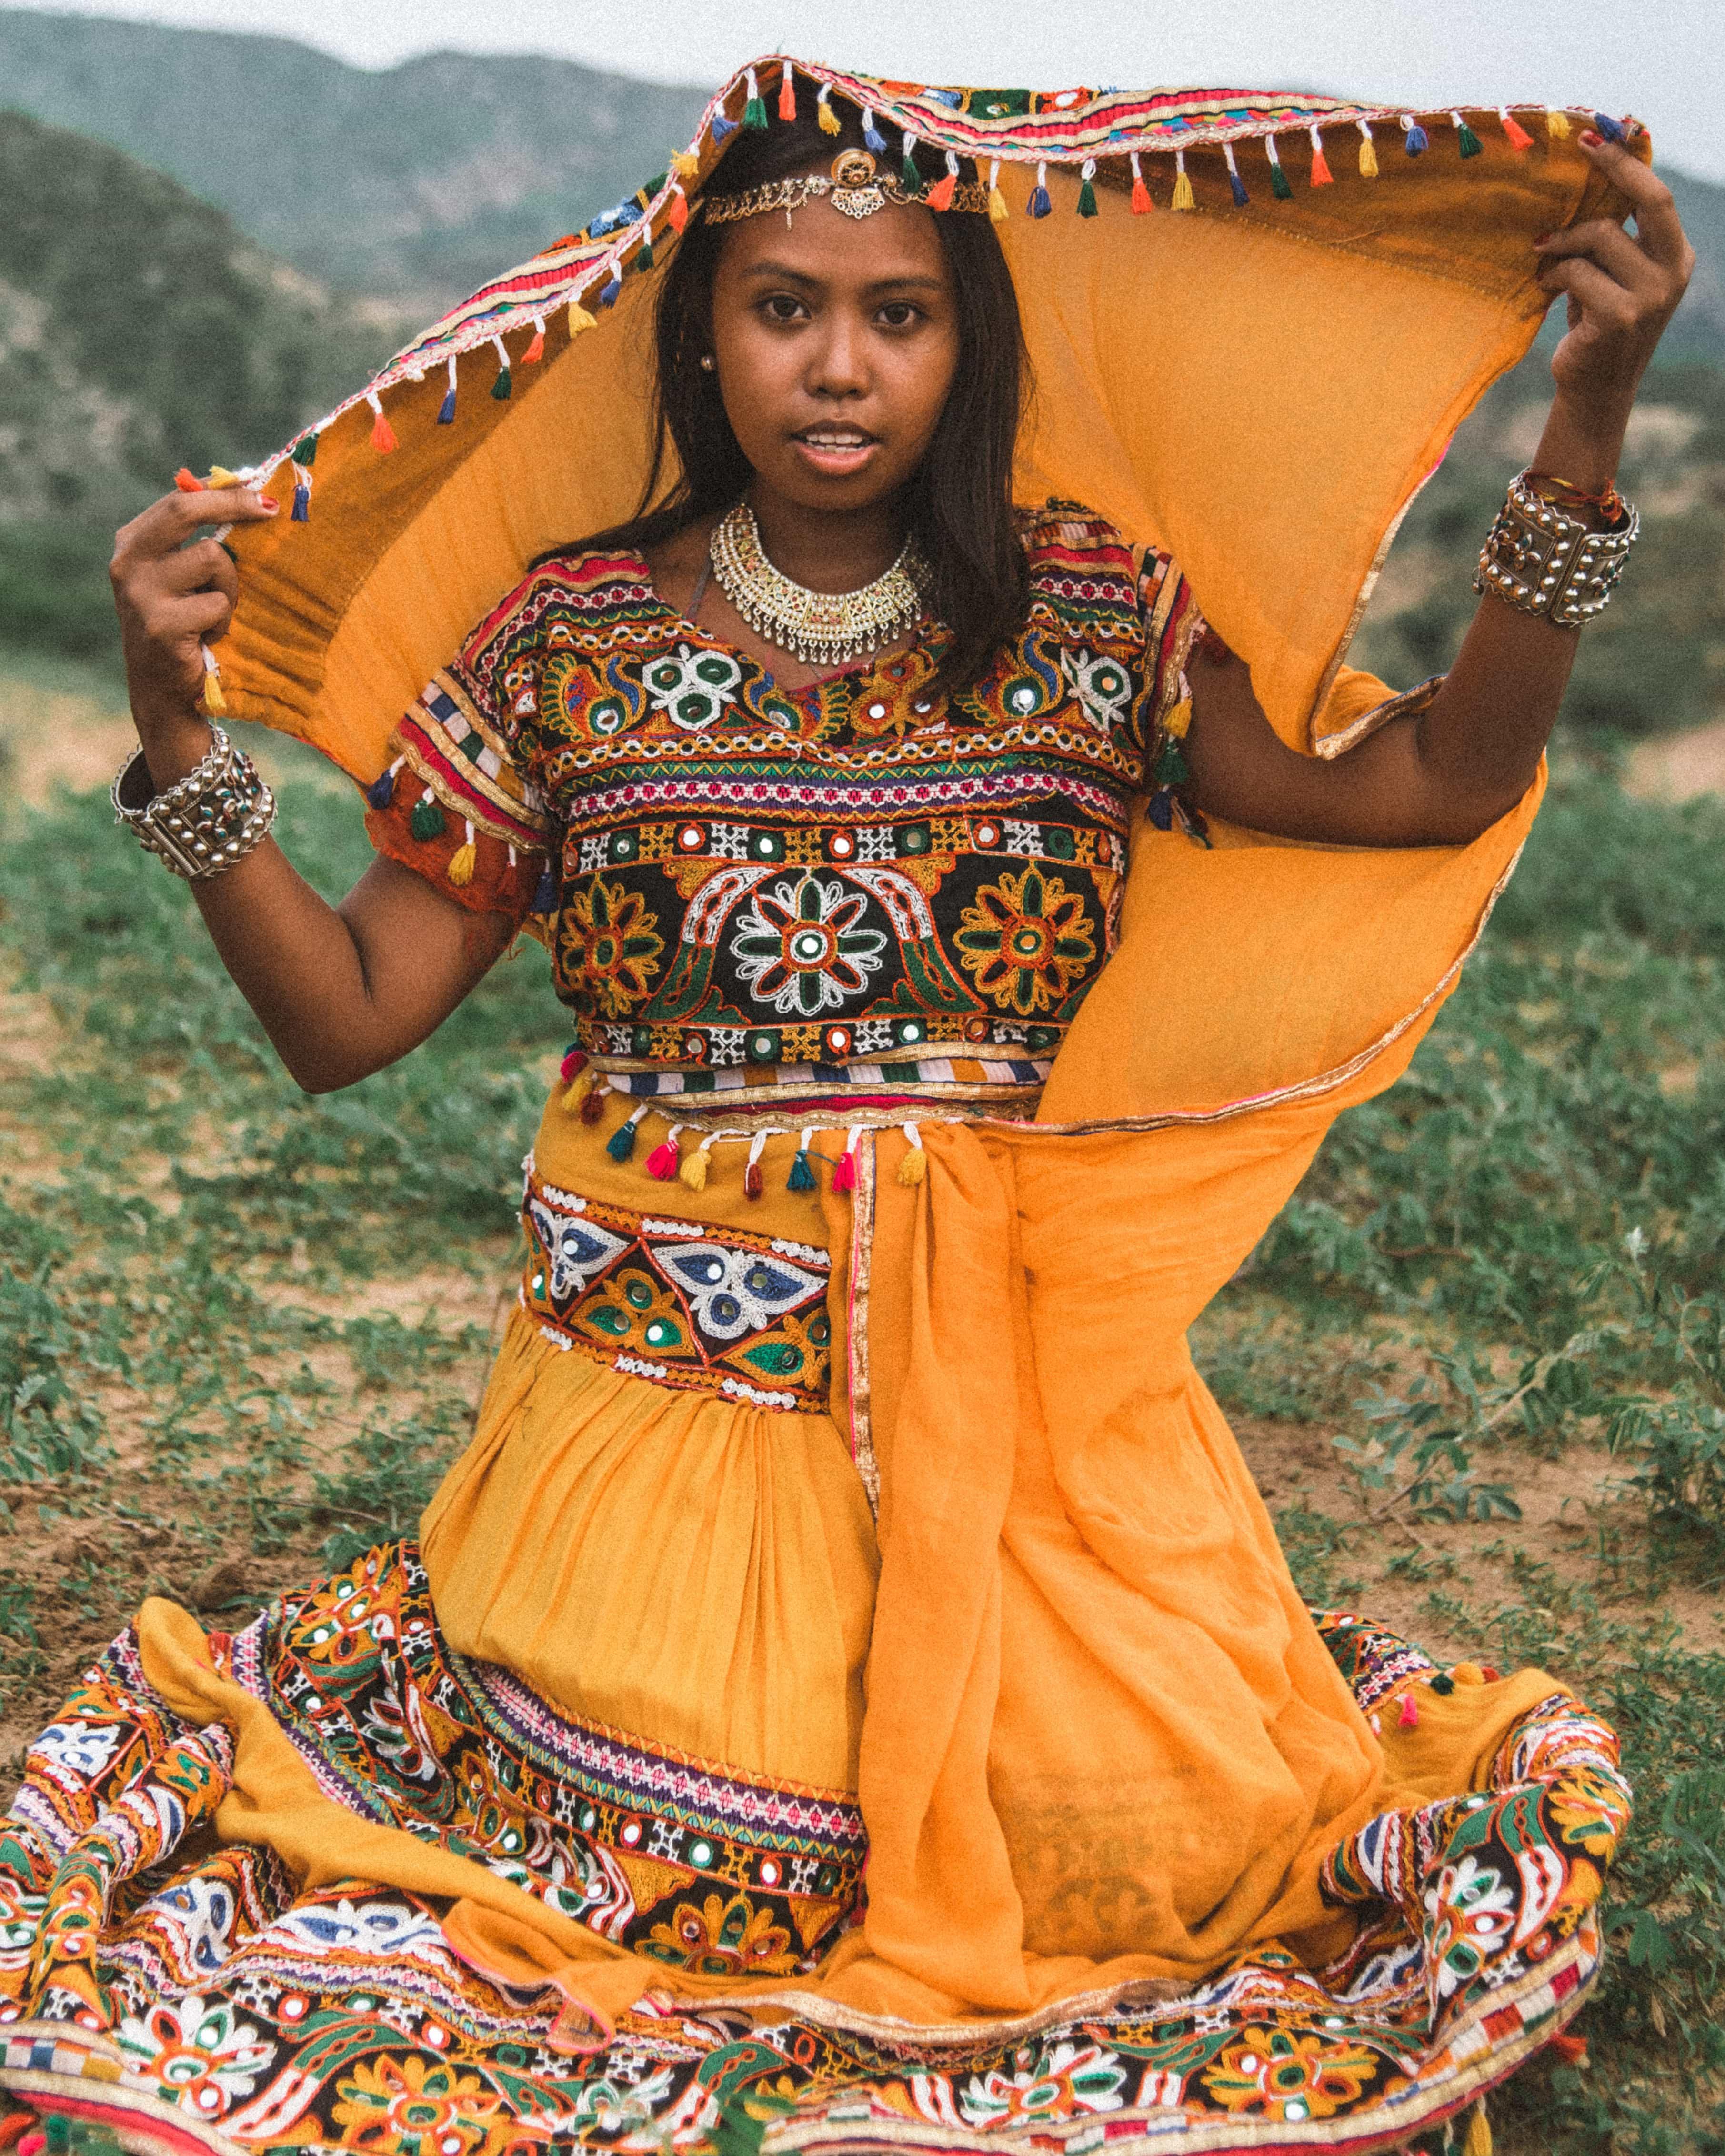 Wearing traditional costumes in Puhskar, things to do in Pushkar, Pushkar travel guide, camel safari in Pushkar